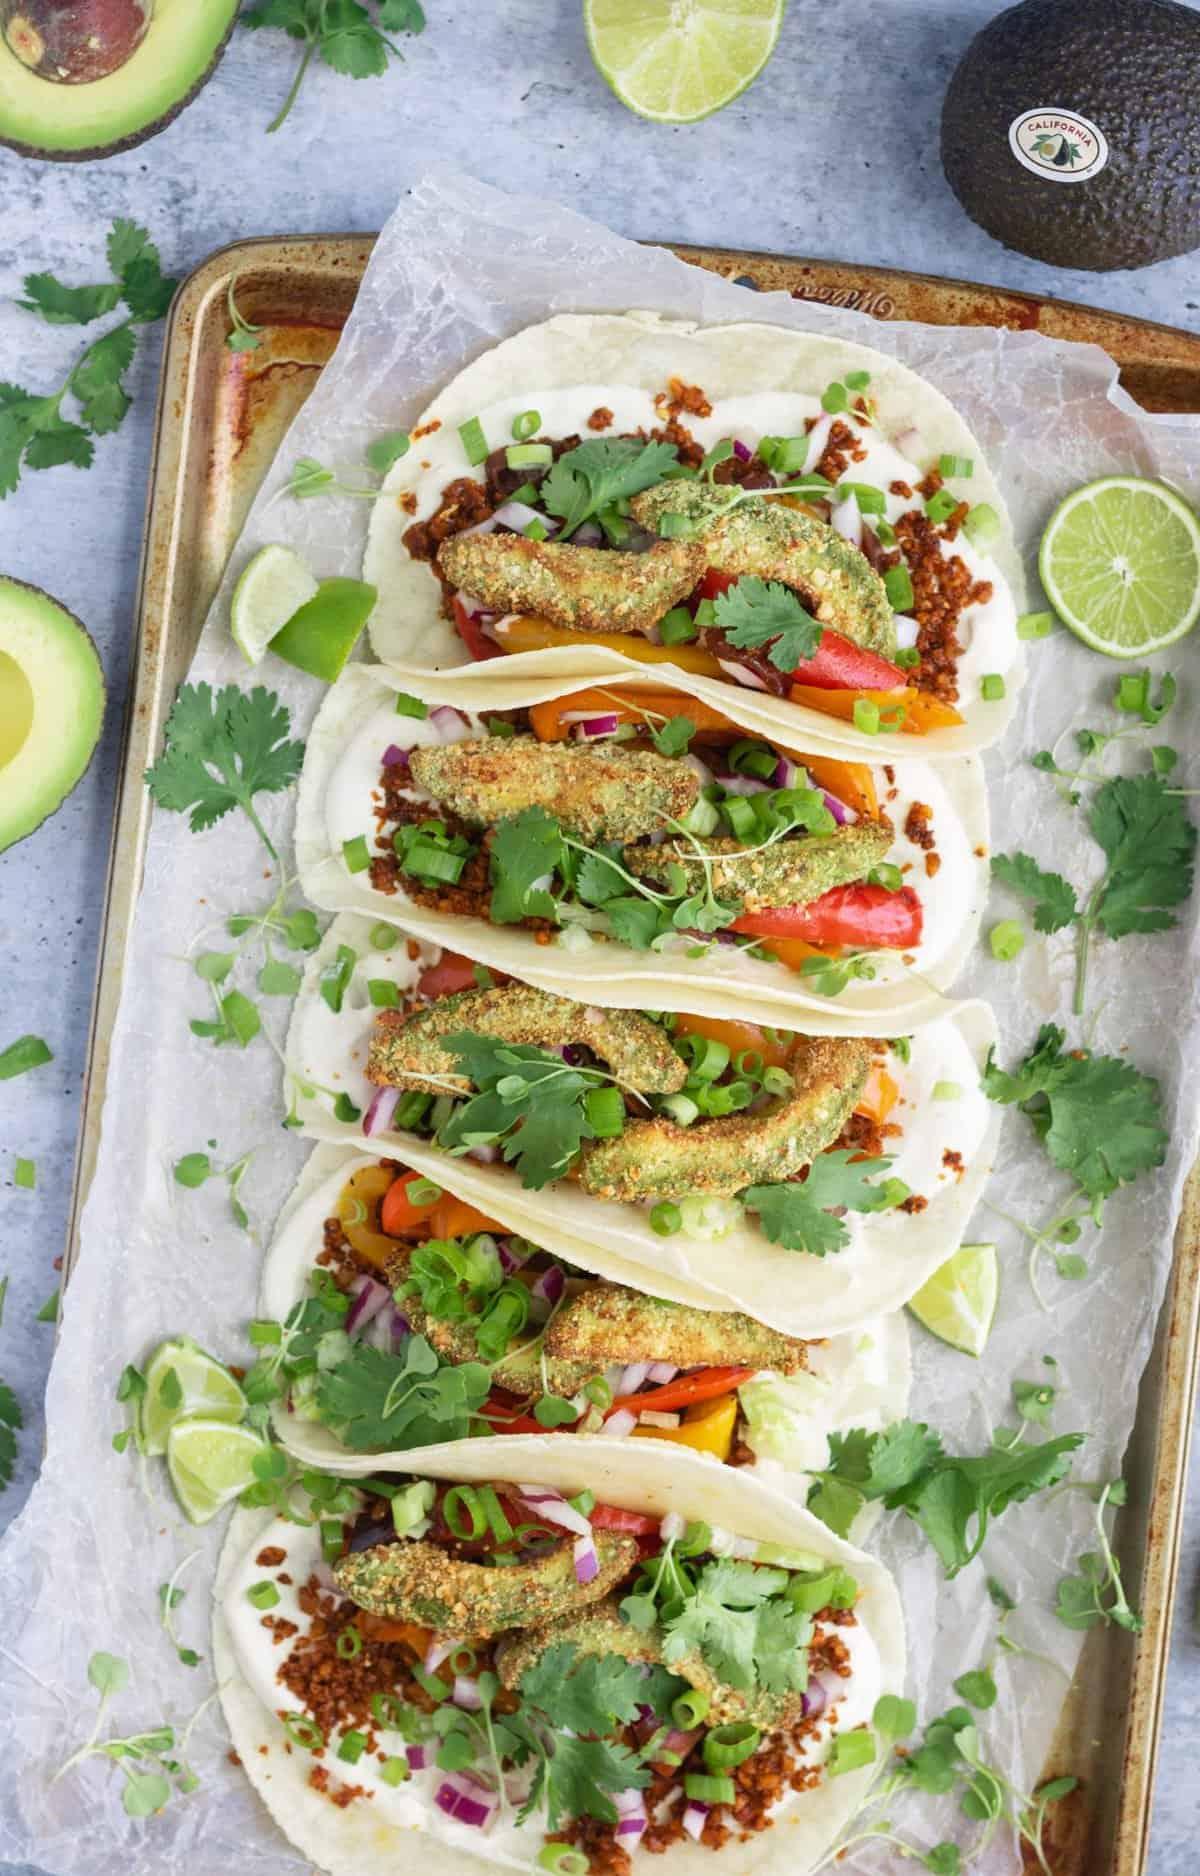 Gluten-Free Vegan Crispy Avocado Tacos